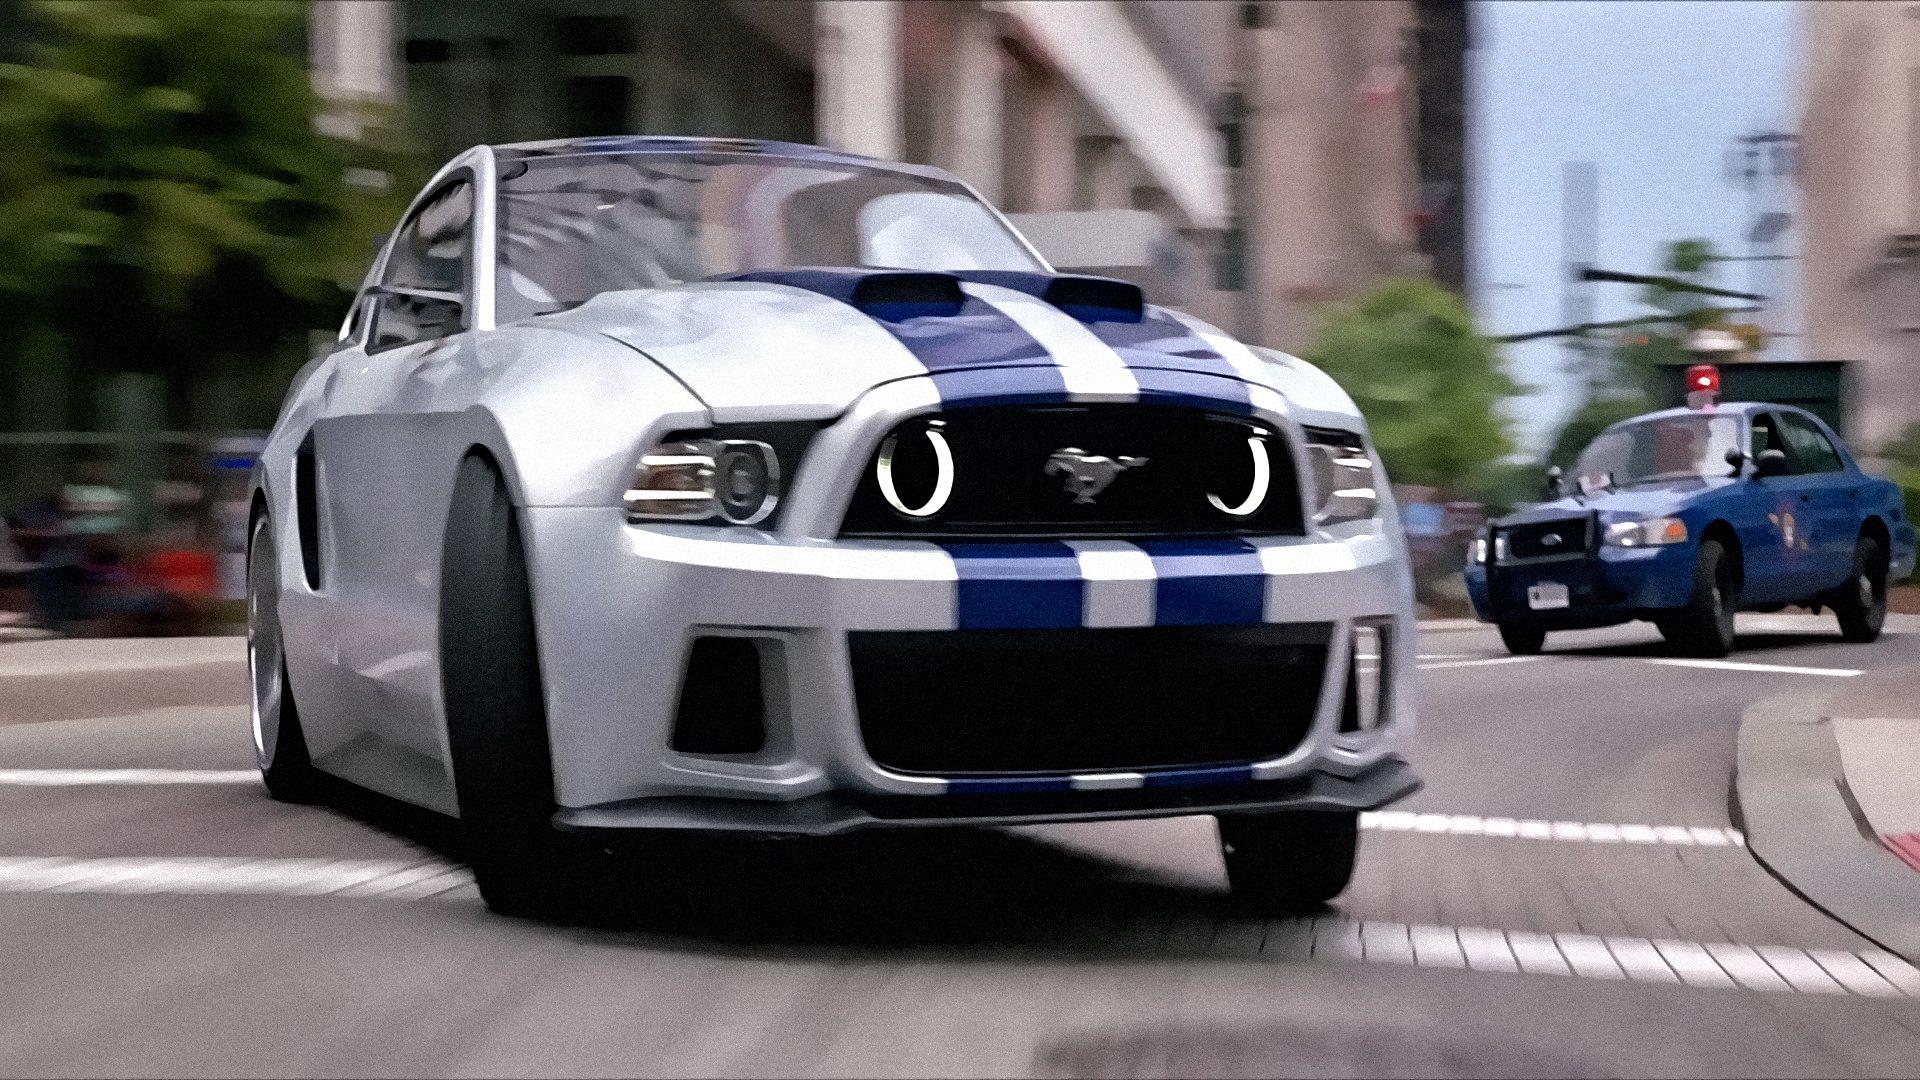 49 Need For Speed Movie Wallpaper On Wallpapersafari